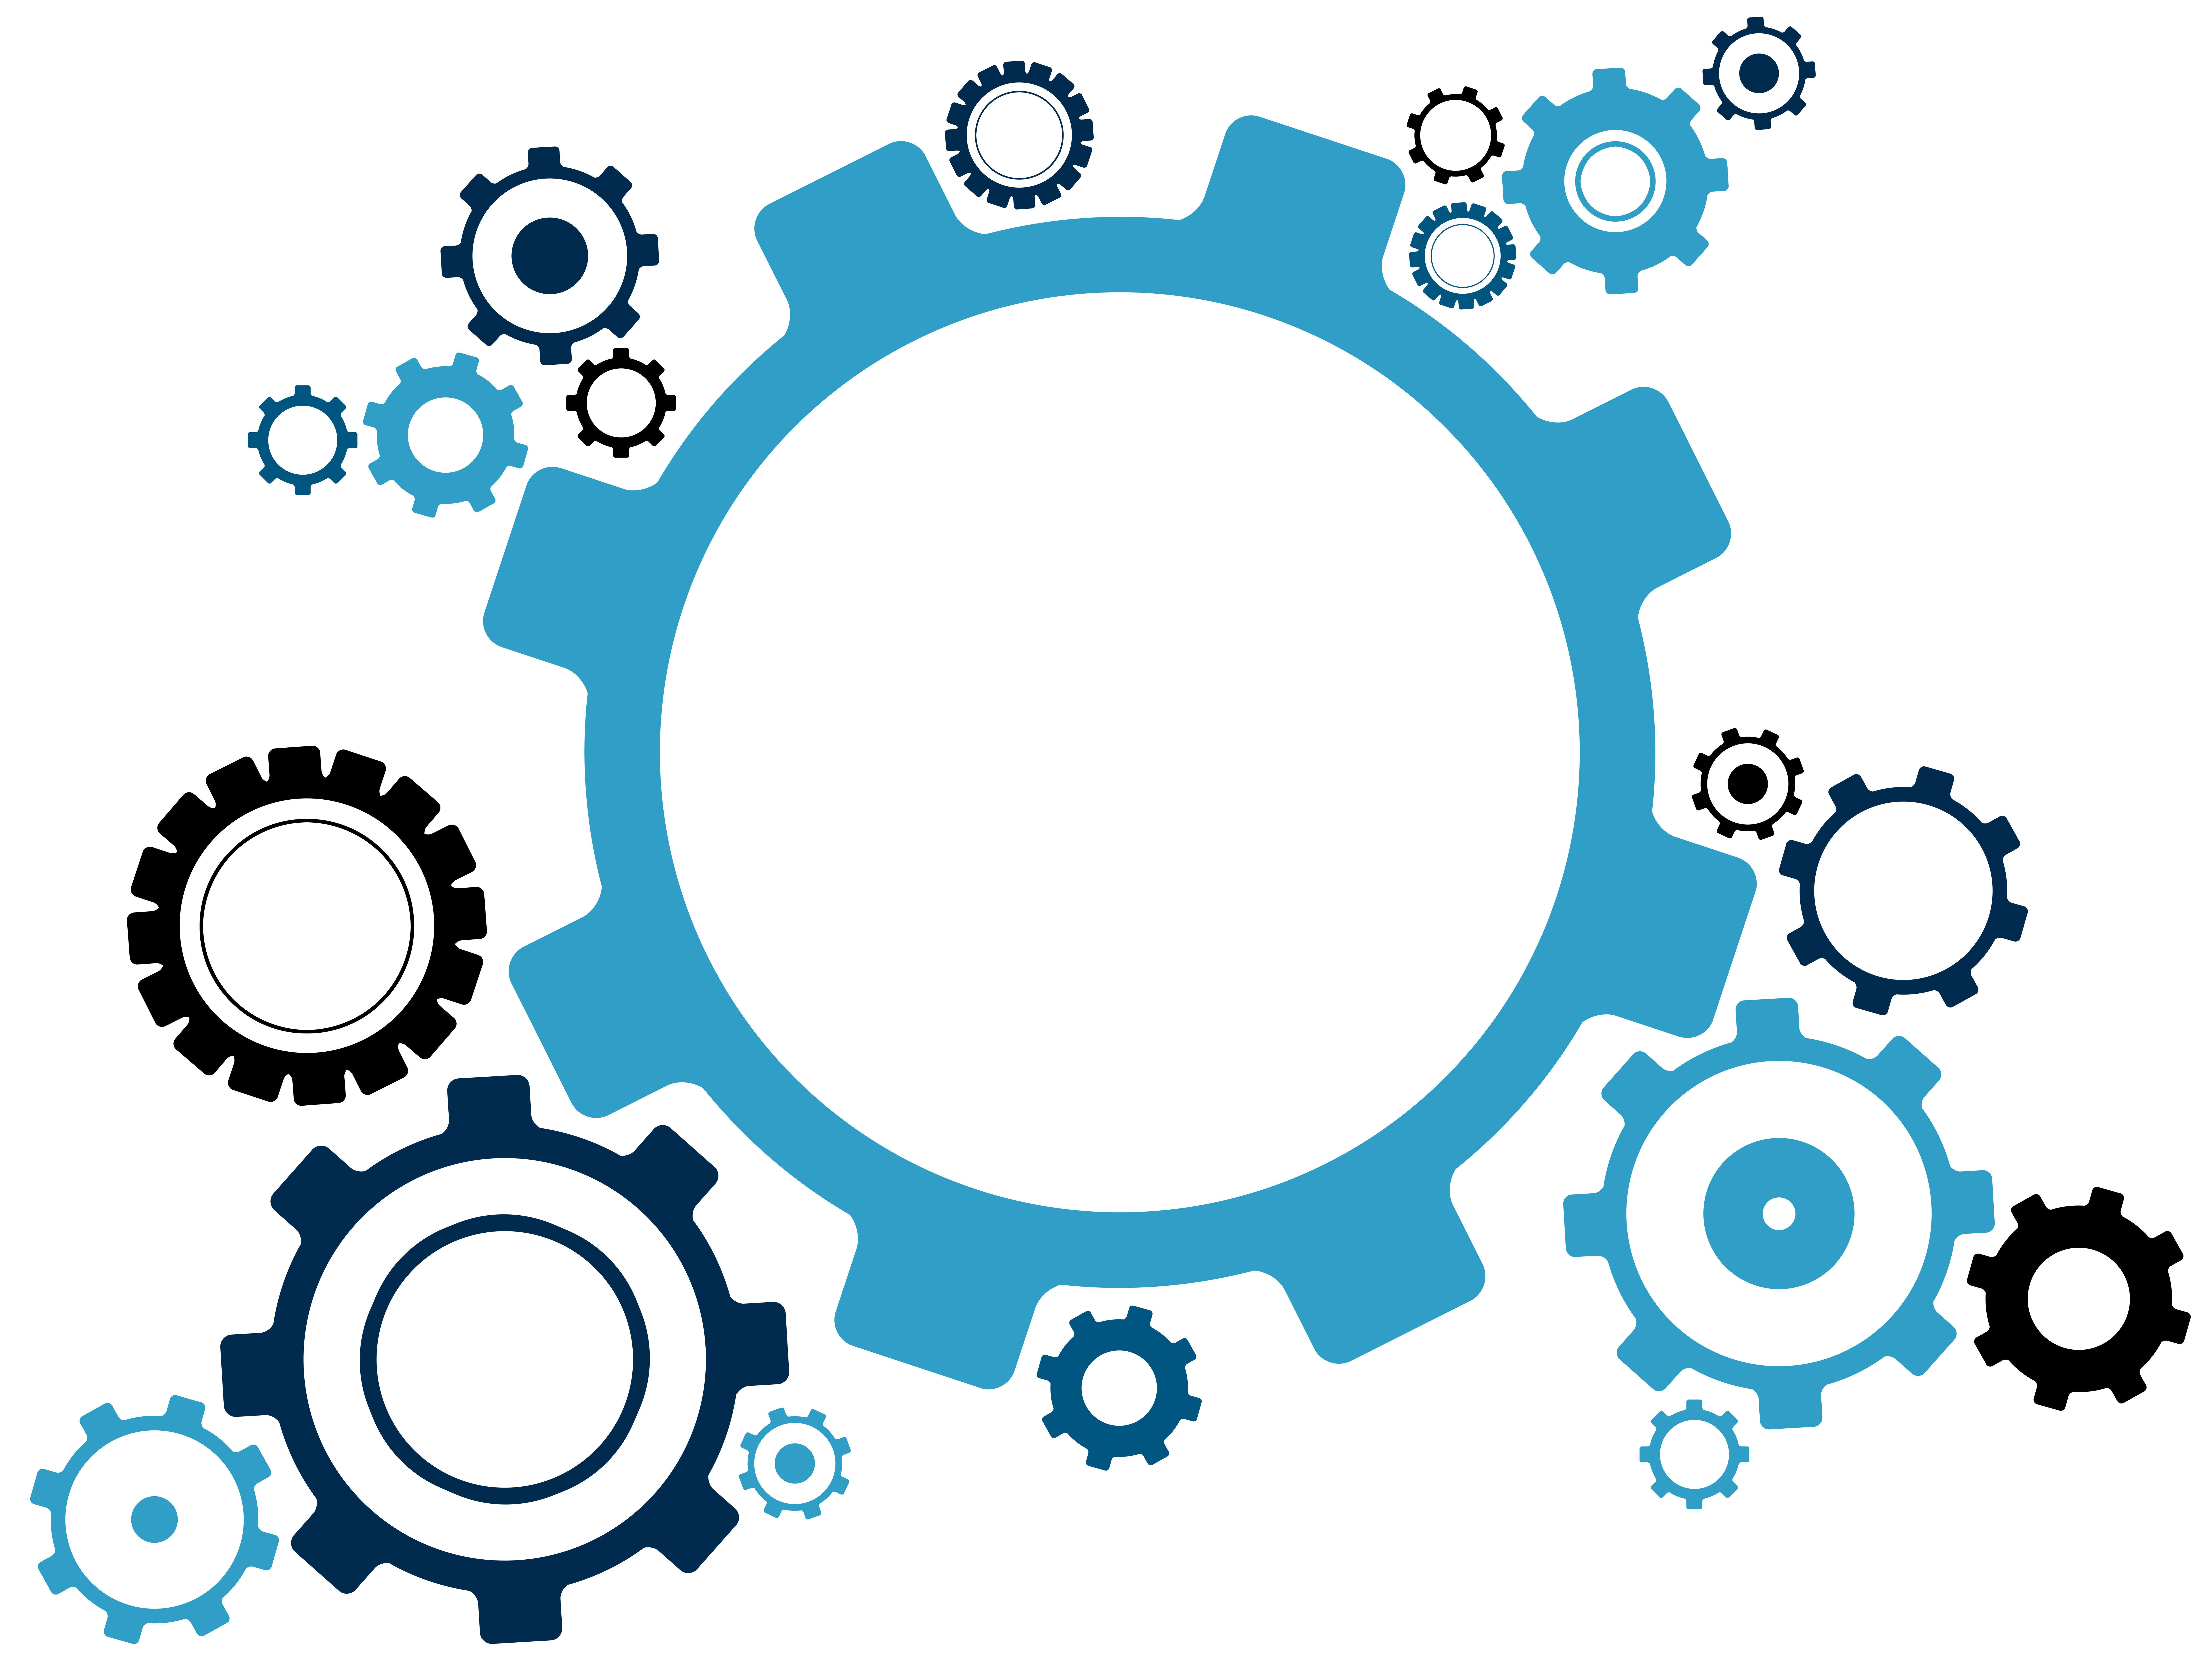 Cogwheel Design Copy Space